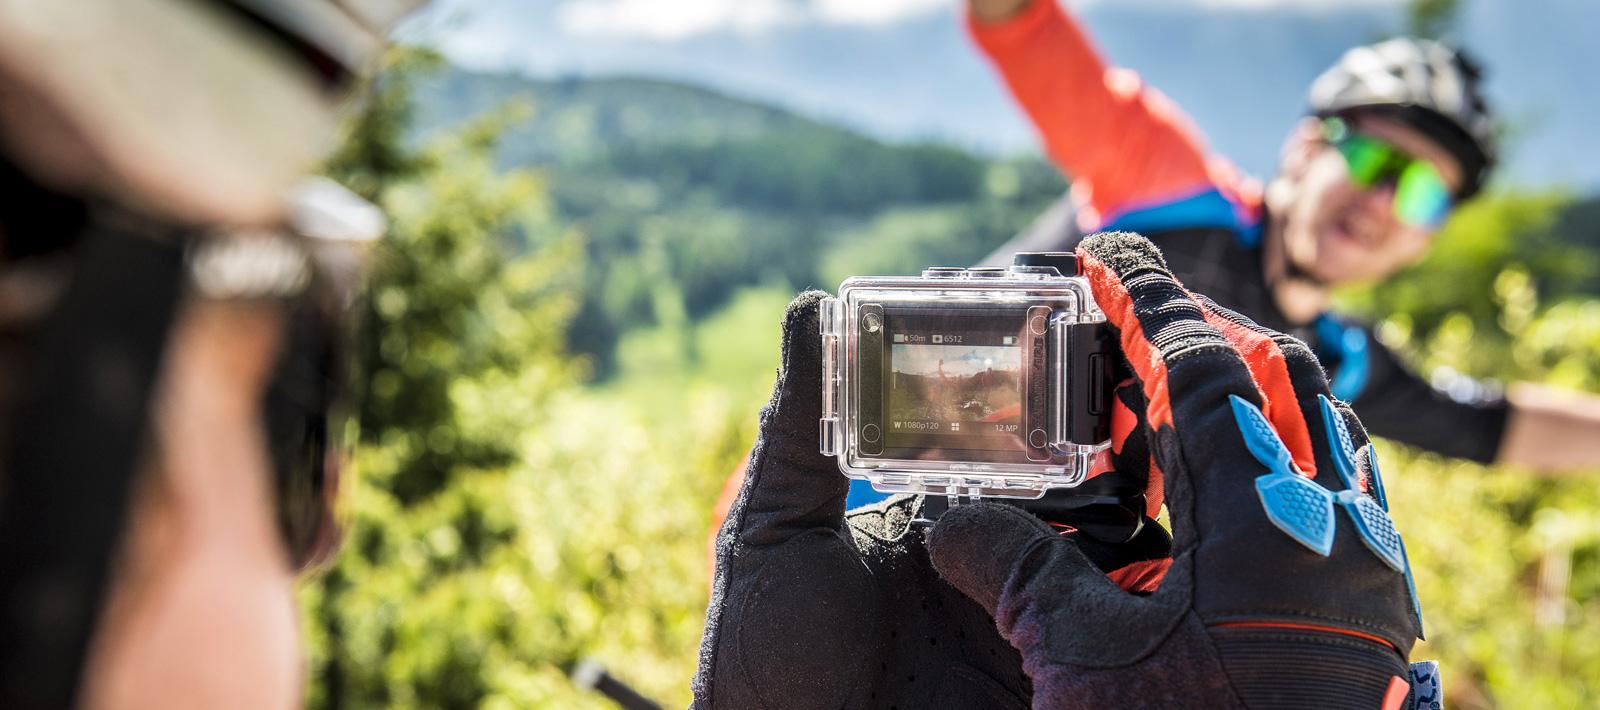 VIRB series (Action-Kameras)